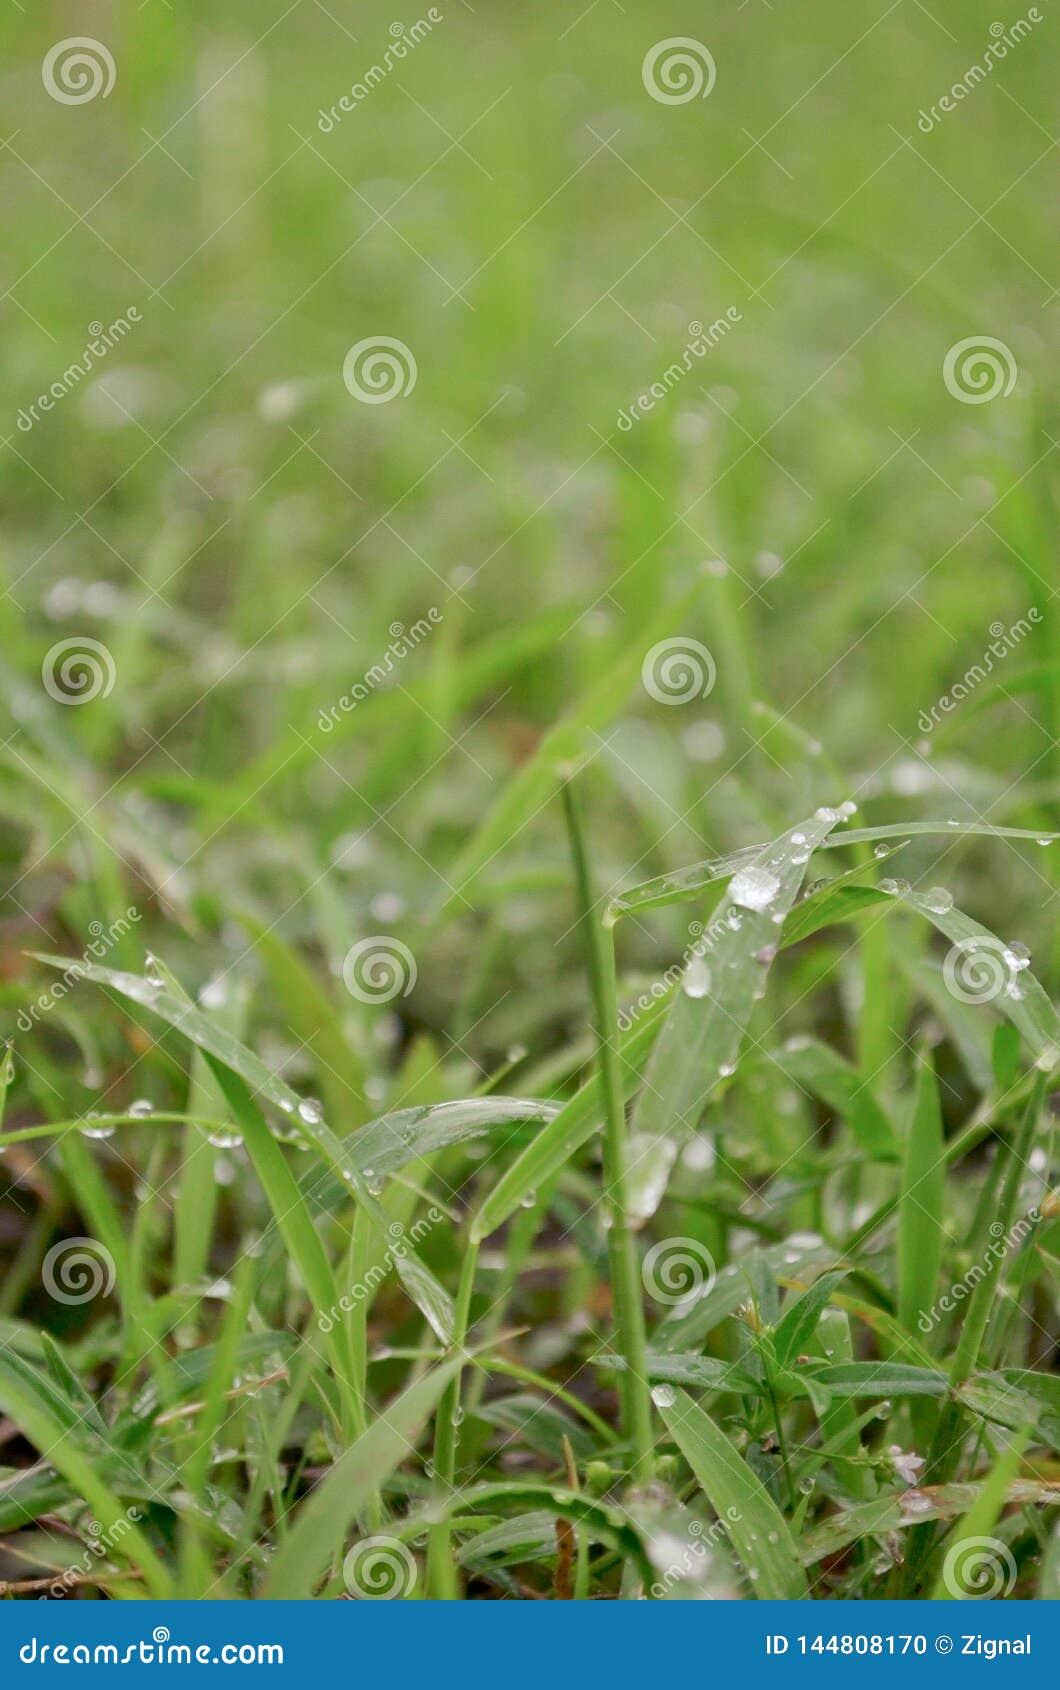 The Grass On The Rain